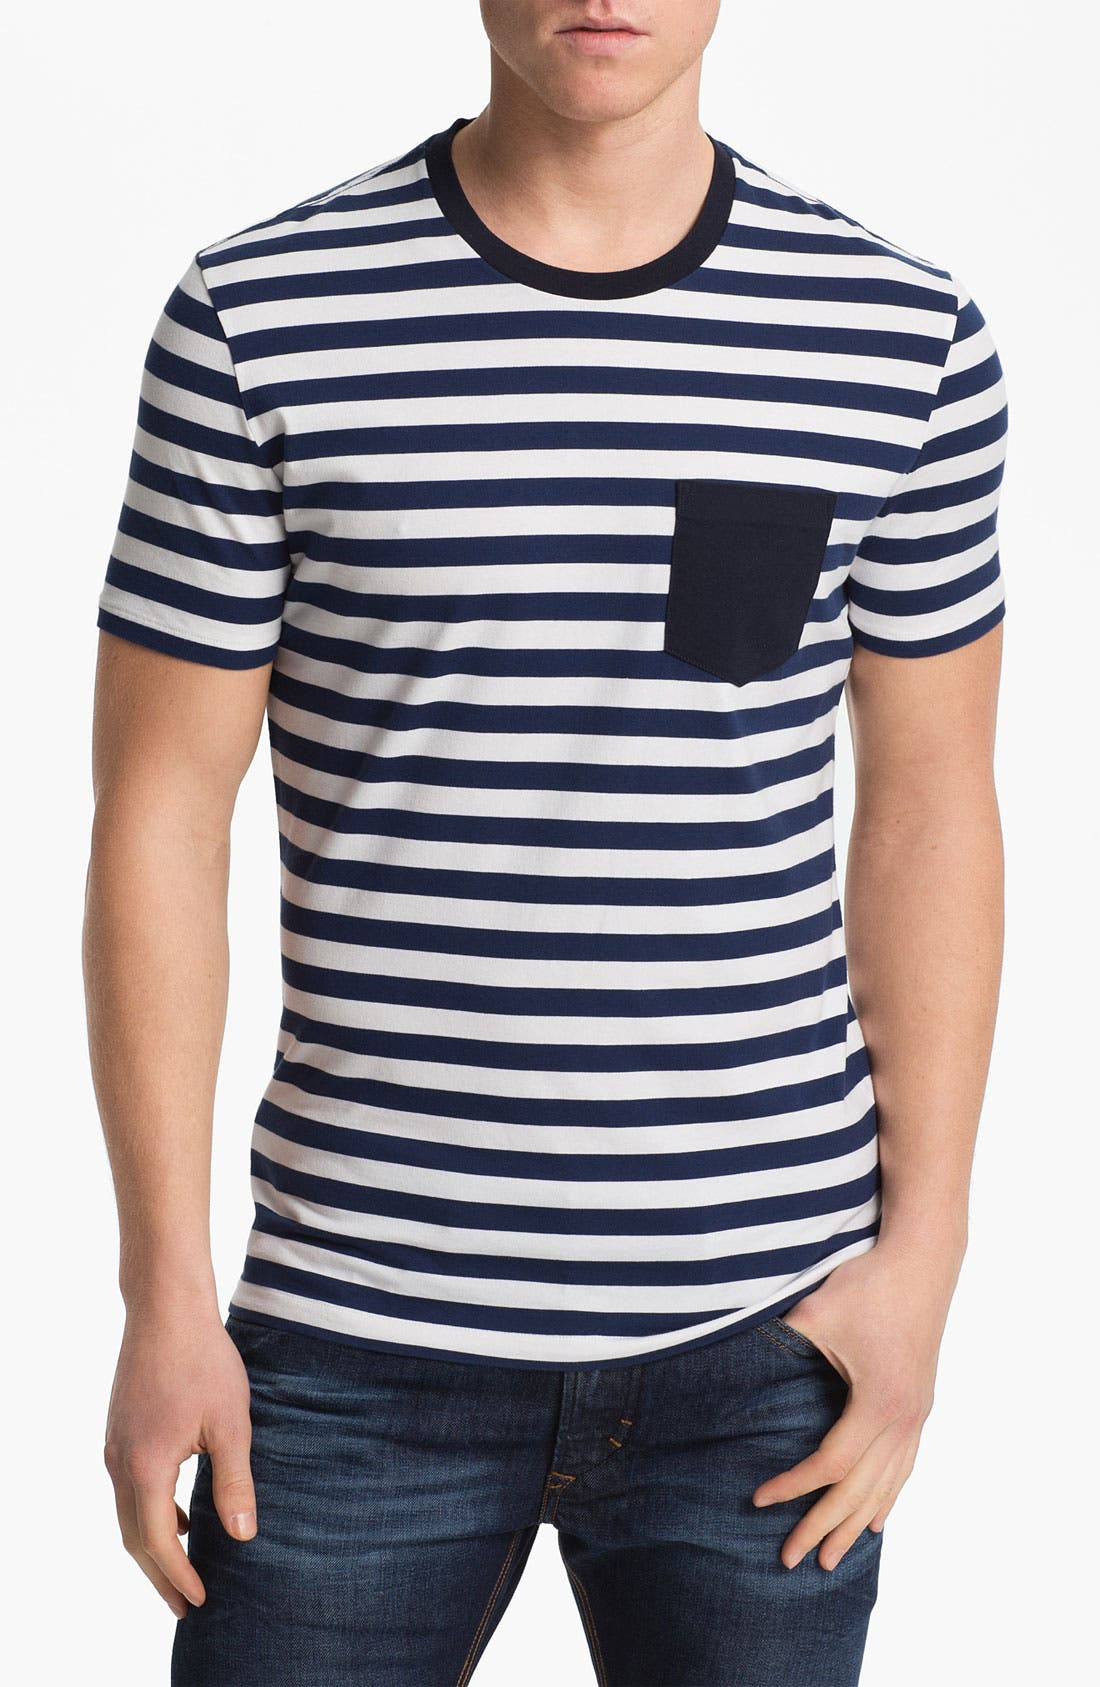 Alternate Image 1 Selected - Burberry Brit 'Kidd' Crewneck T-Shirt